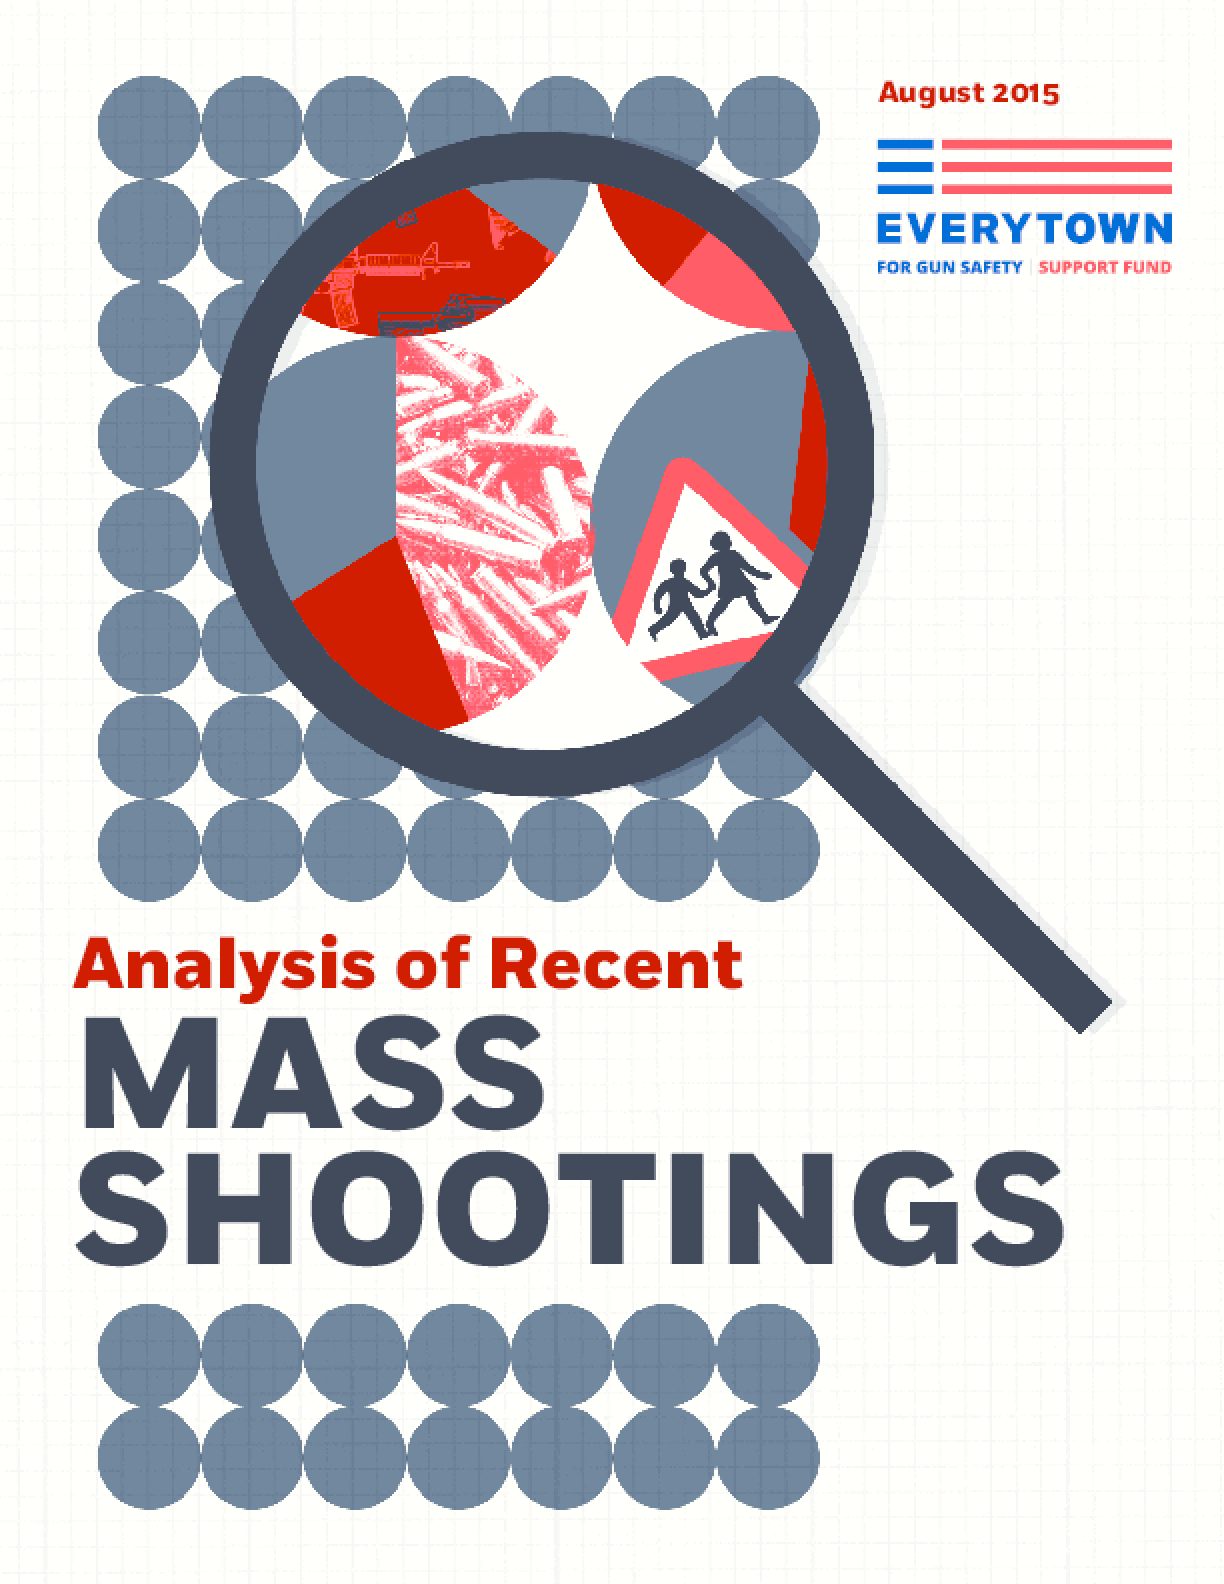 Analysis of Recent Mass Shootings